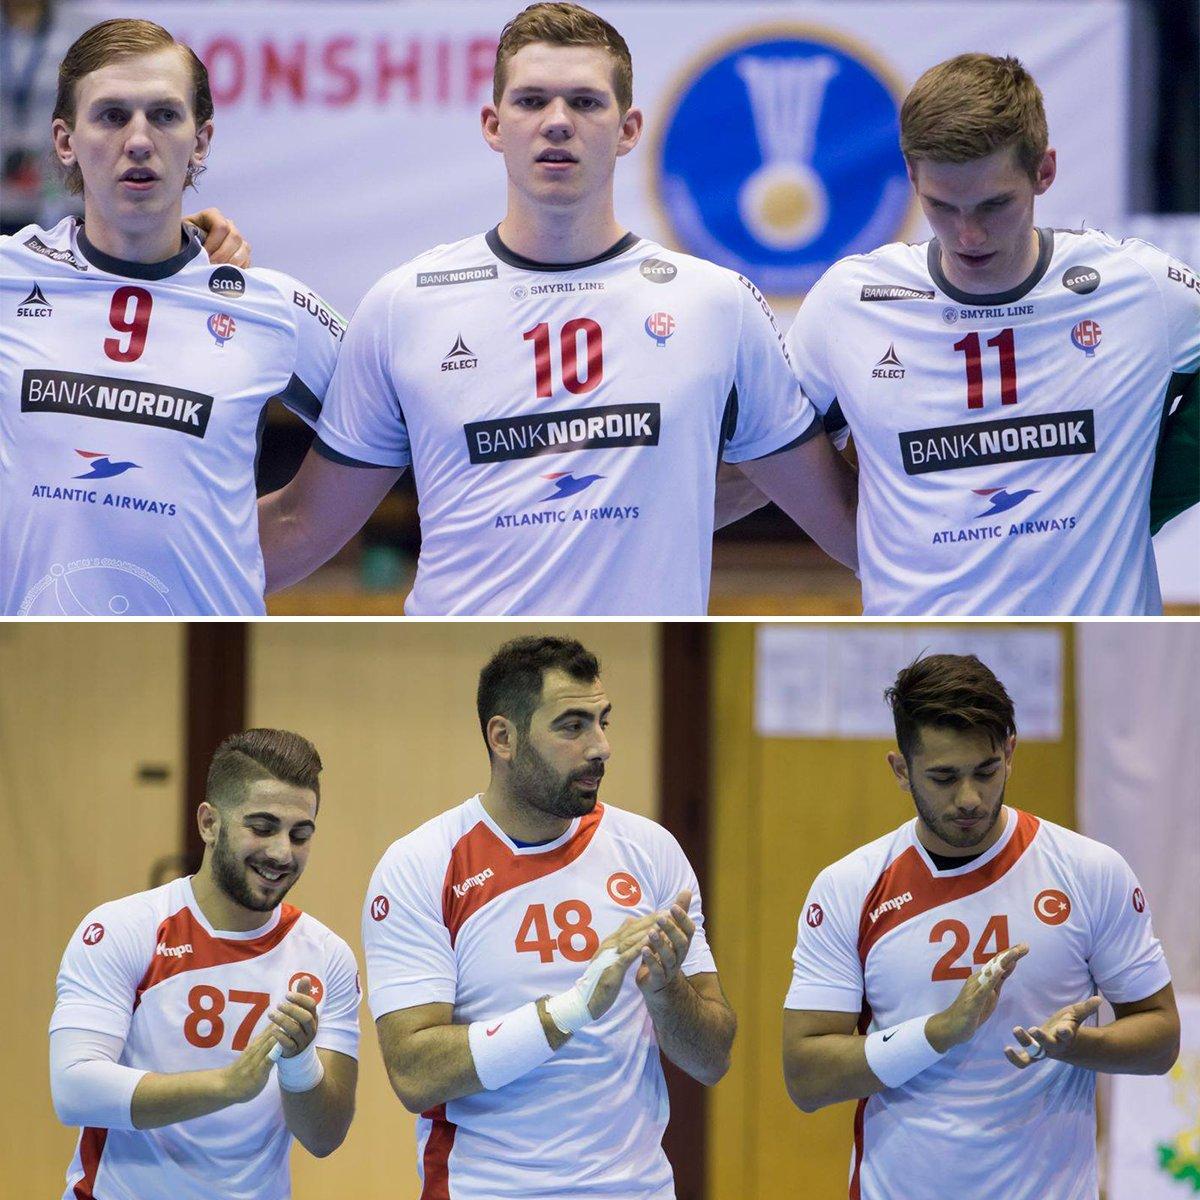 Turkey &amp; Faroe Islands are the 2017 Emerging Nations Men&#39;s Championship finalists  #EmergingNations #Turkey #FaroeIsnads #IHF #Handball <br>http://pic.twitter.com/gEPmX3fz8g